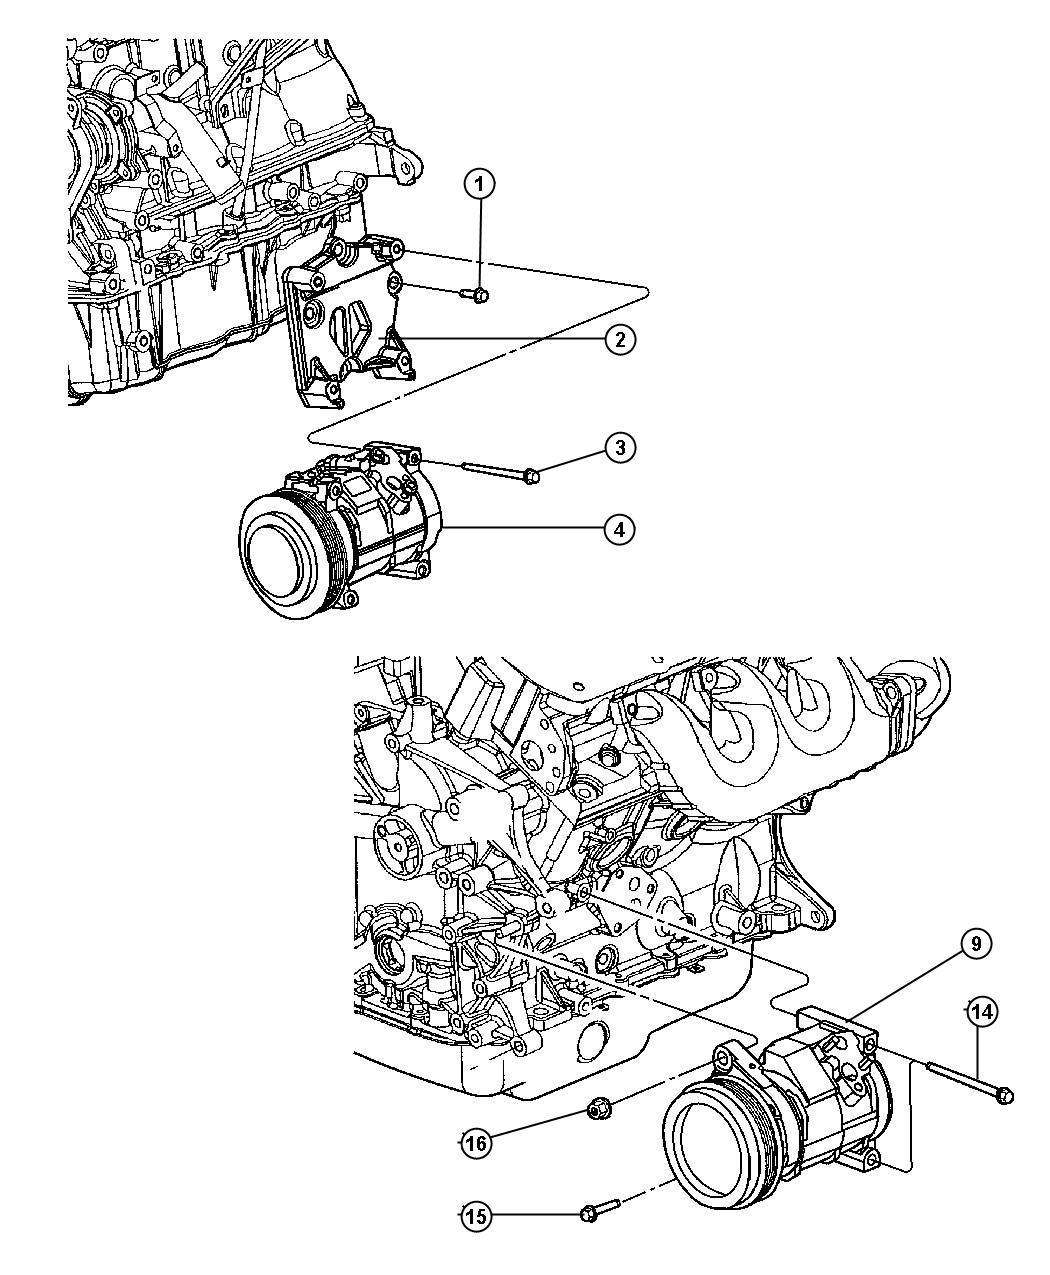 Dodge Caliber Compressor Air Conditioningsel Engine